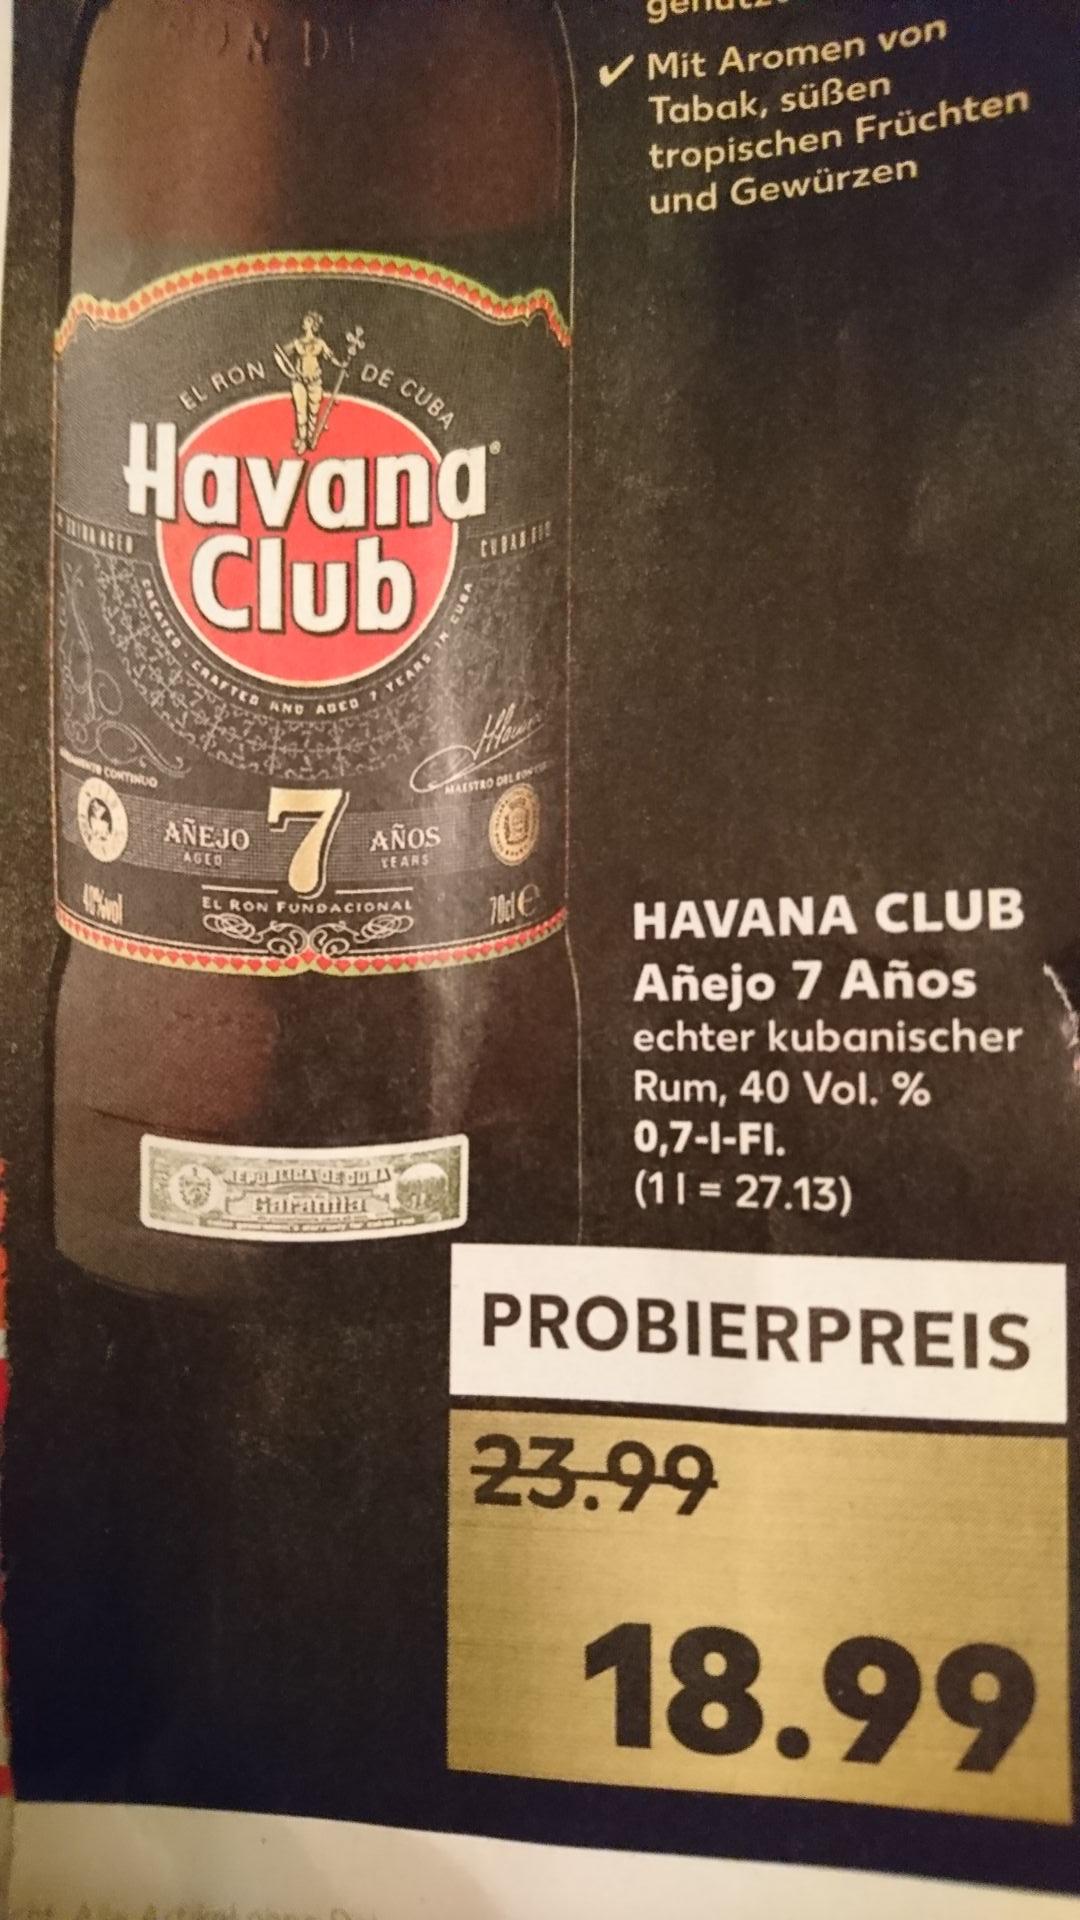 Havana Club Añejo 7 Años Rum 0,7l [Kaufland]